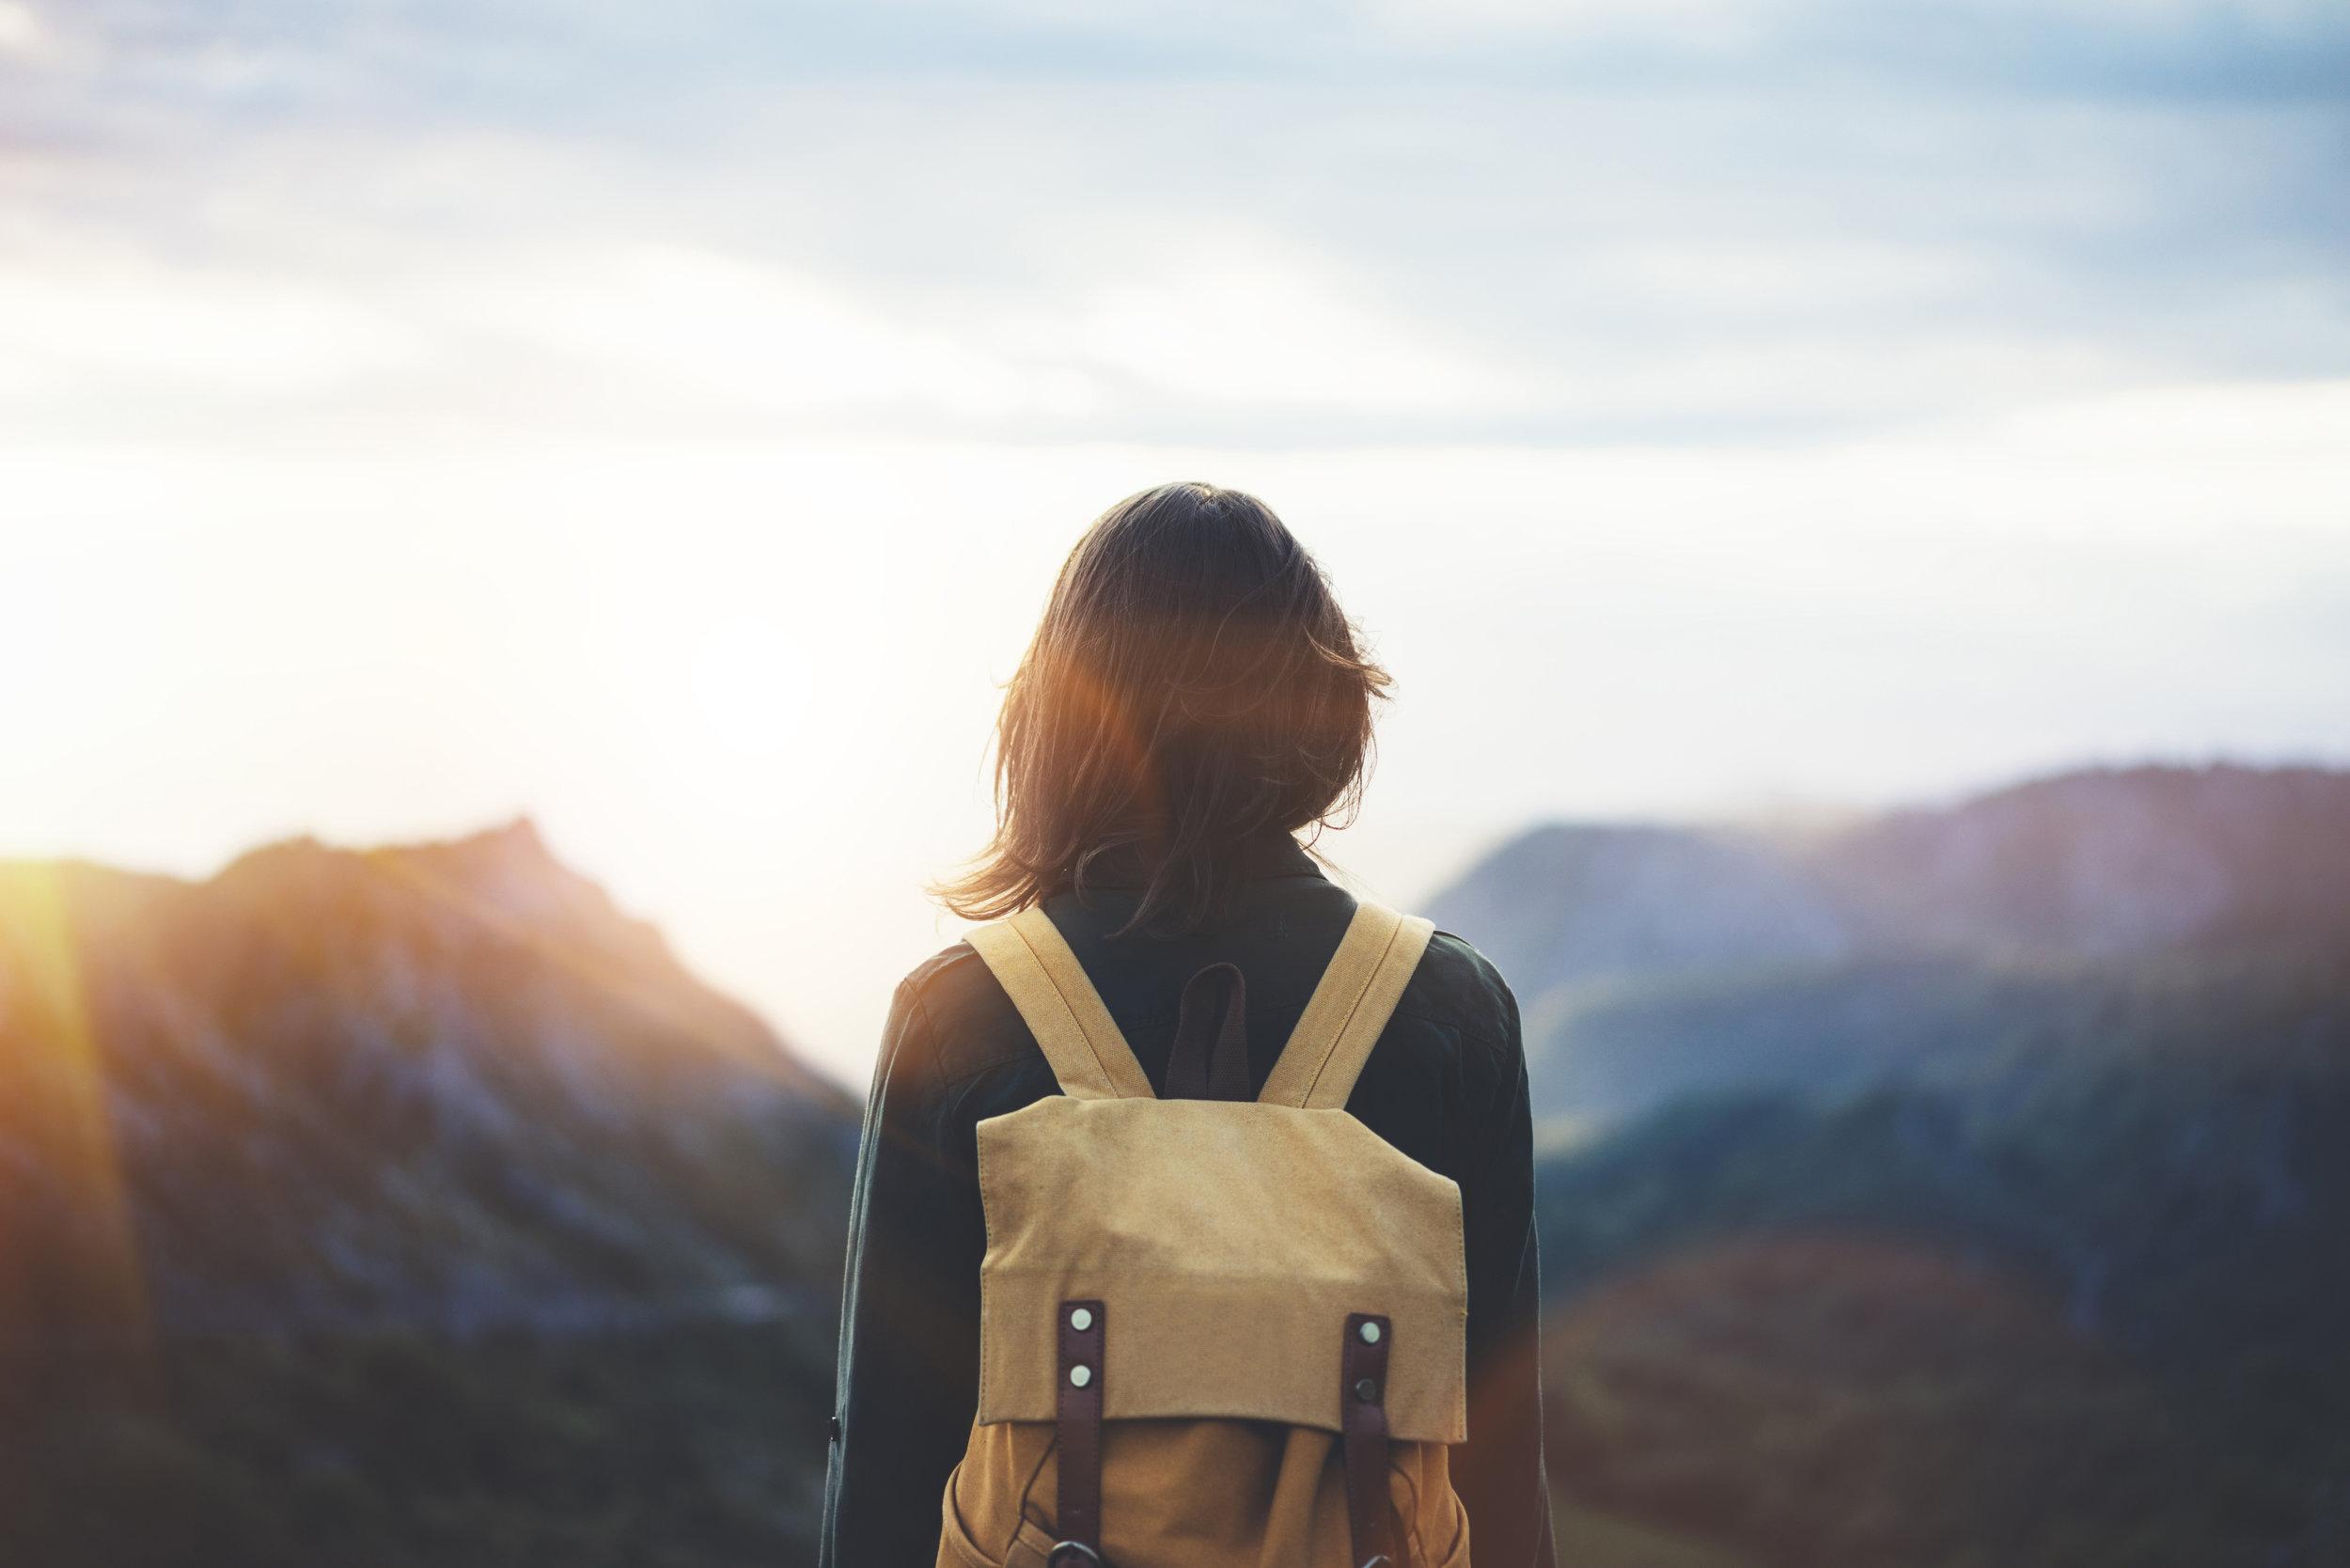 Entreprenista Mama | A blog for working women.